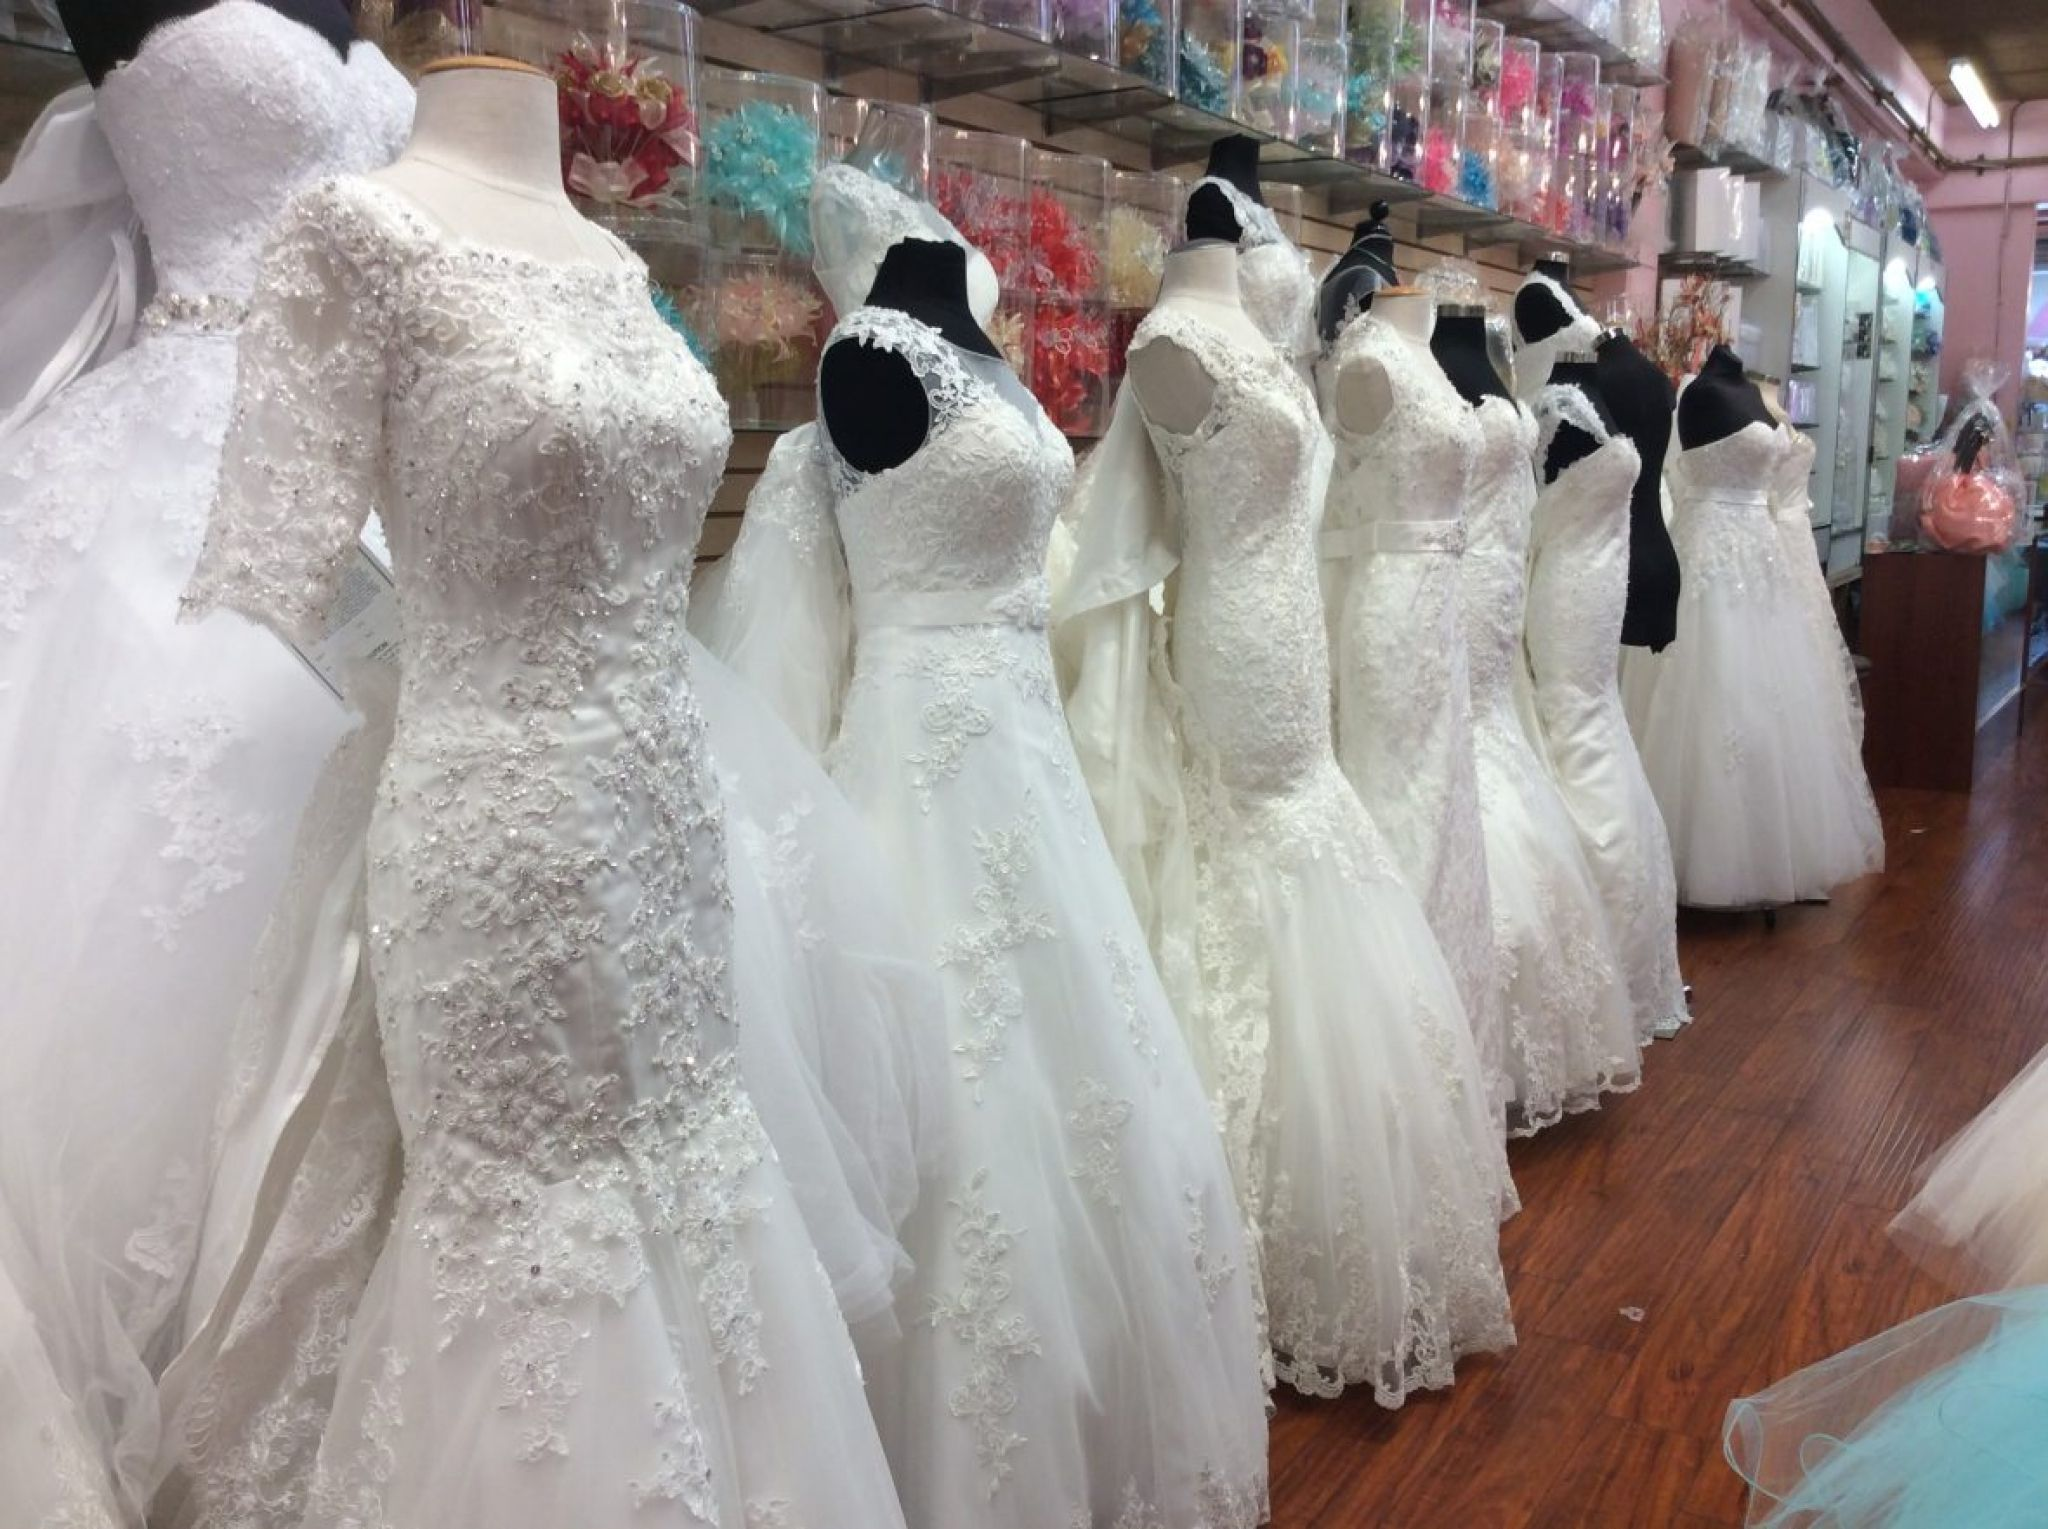 Wedding Dress Los Angeles Country Dresses For Weddings Check More At Http Svesty Com Wedding D Wedding Dresses Wedding Guest Dress Blue Wedding Dress Royal